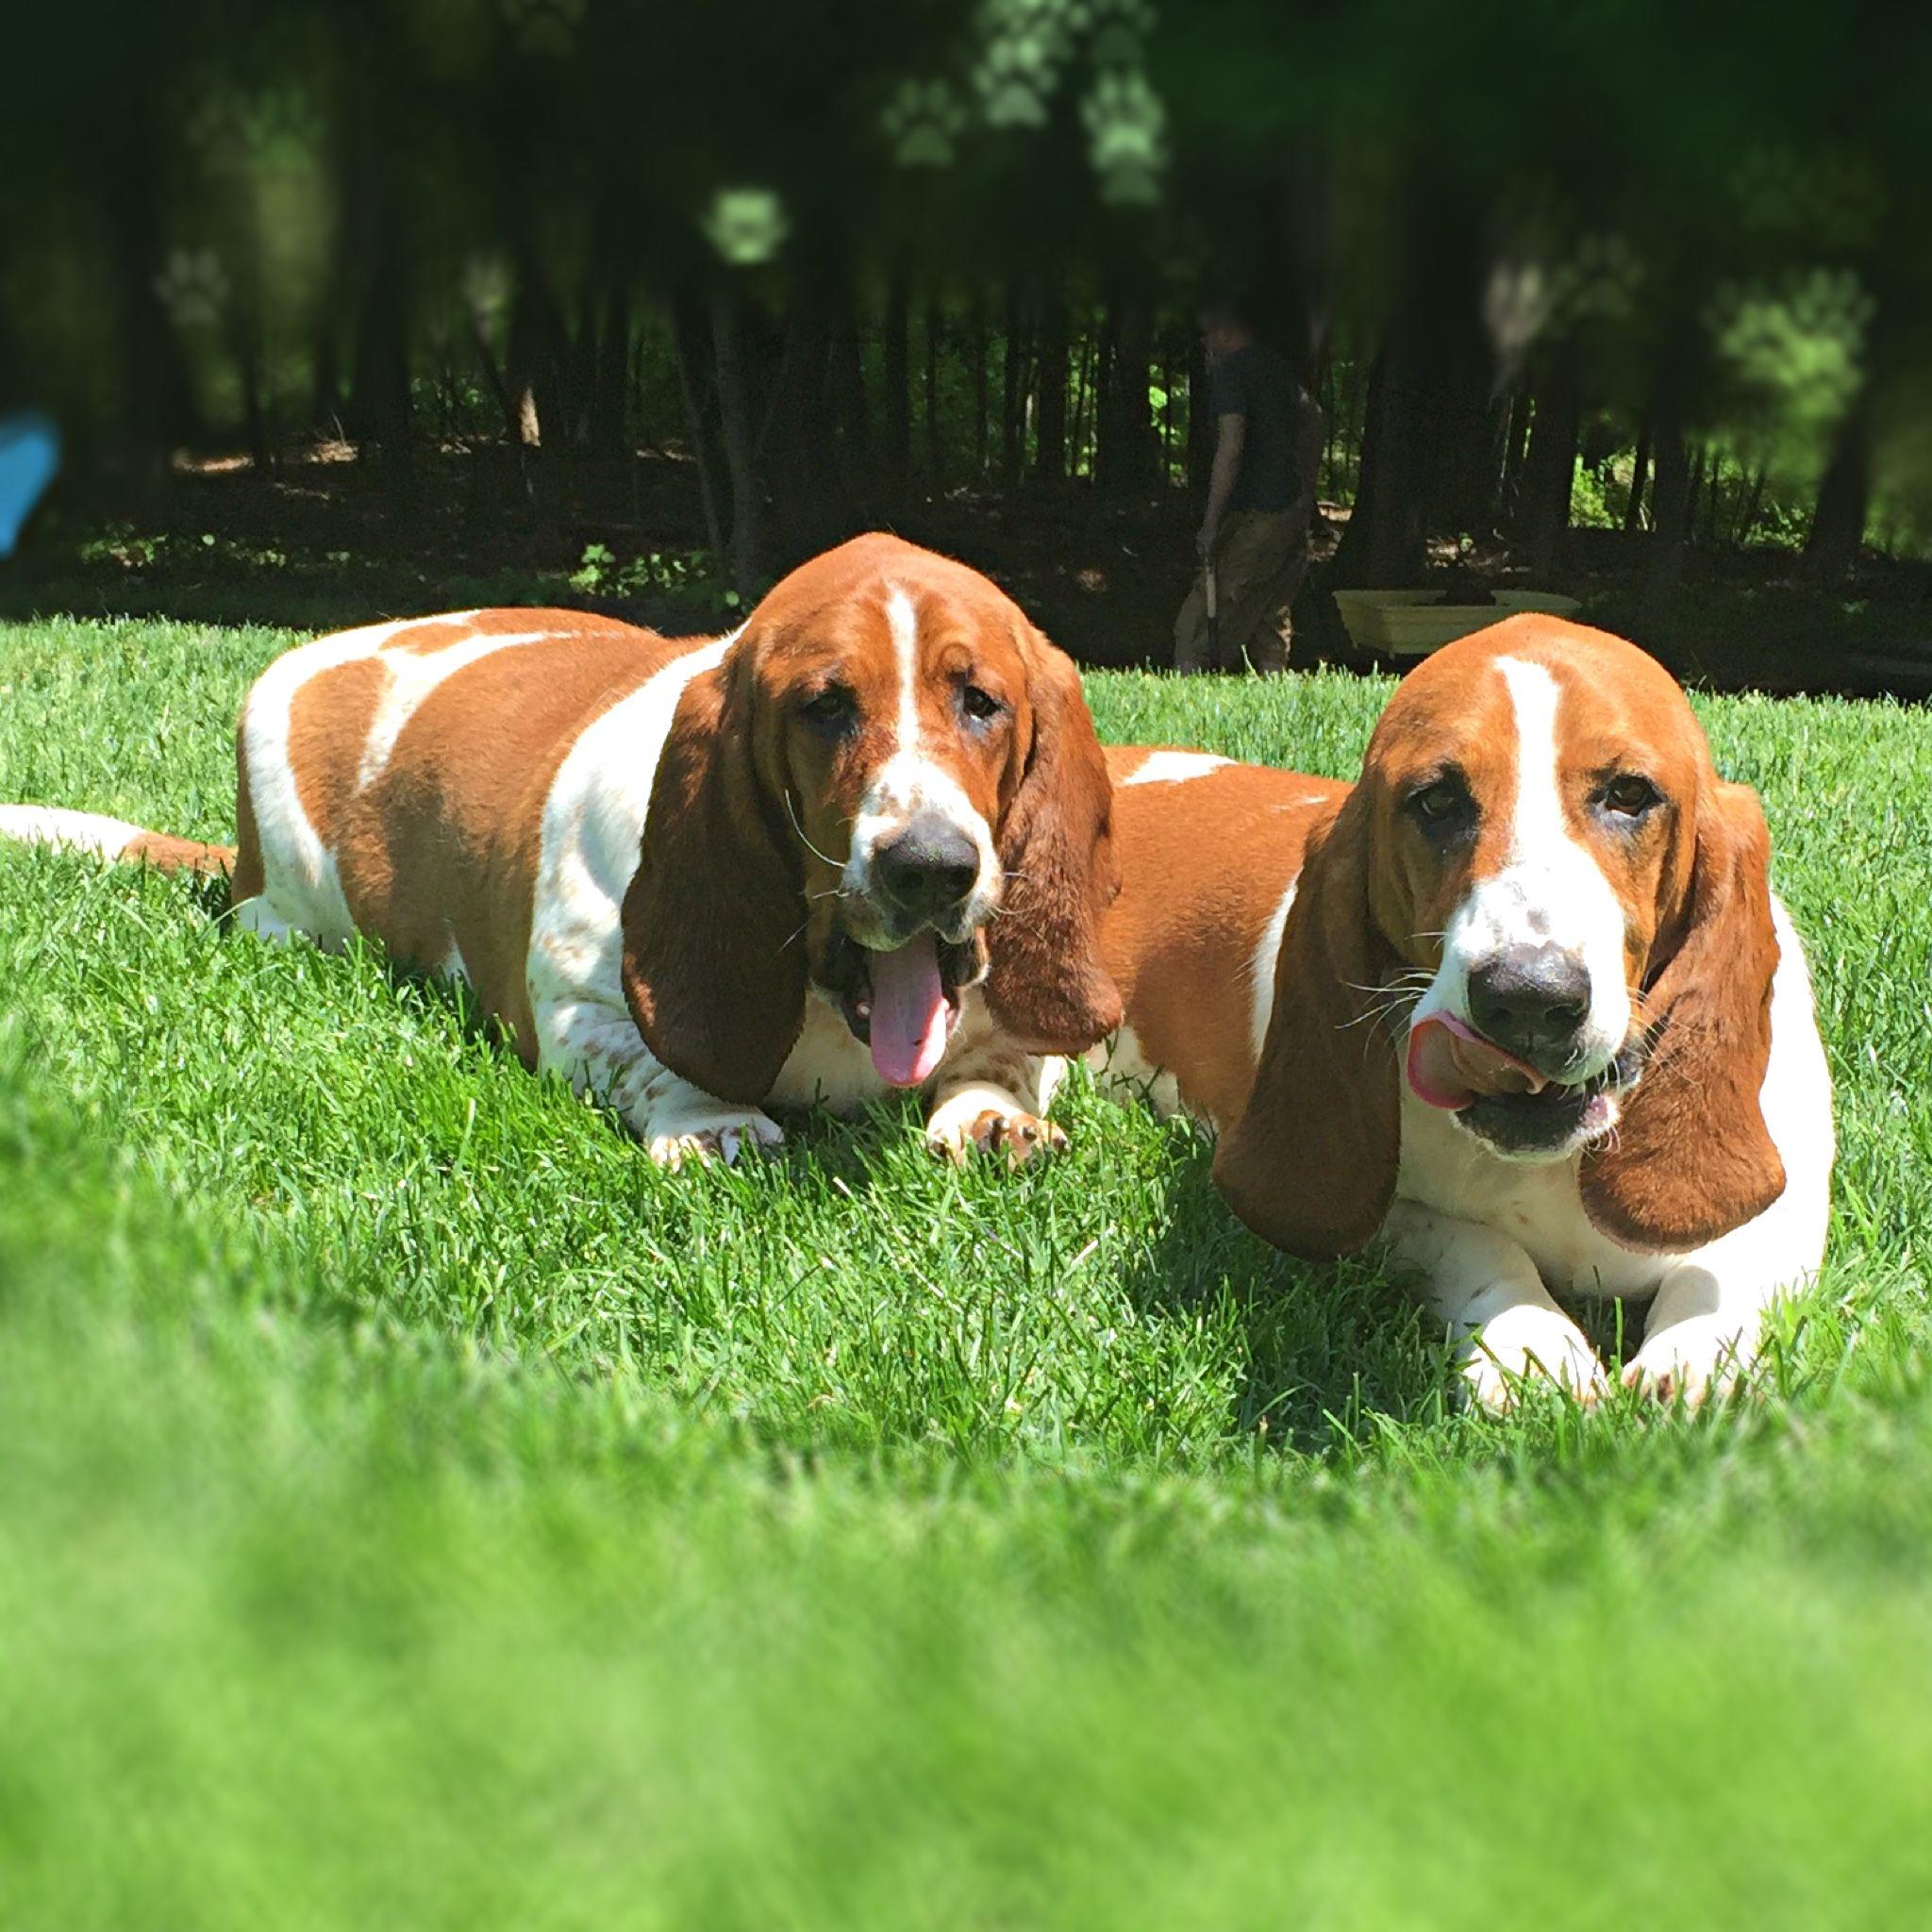 Basset Hound Twin Brothers Bassethound Puppies Basset Dog Basset Hound Basset Hound Puppy